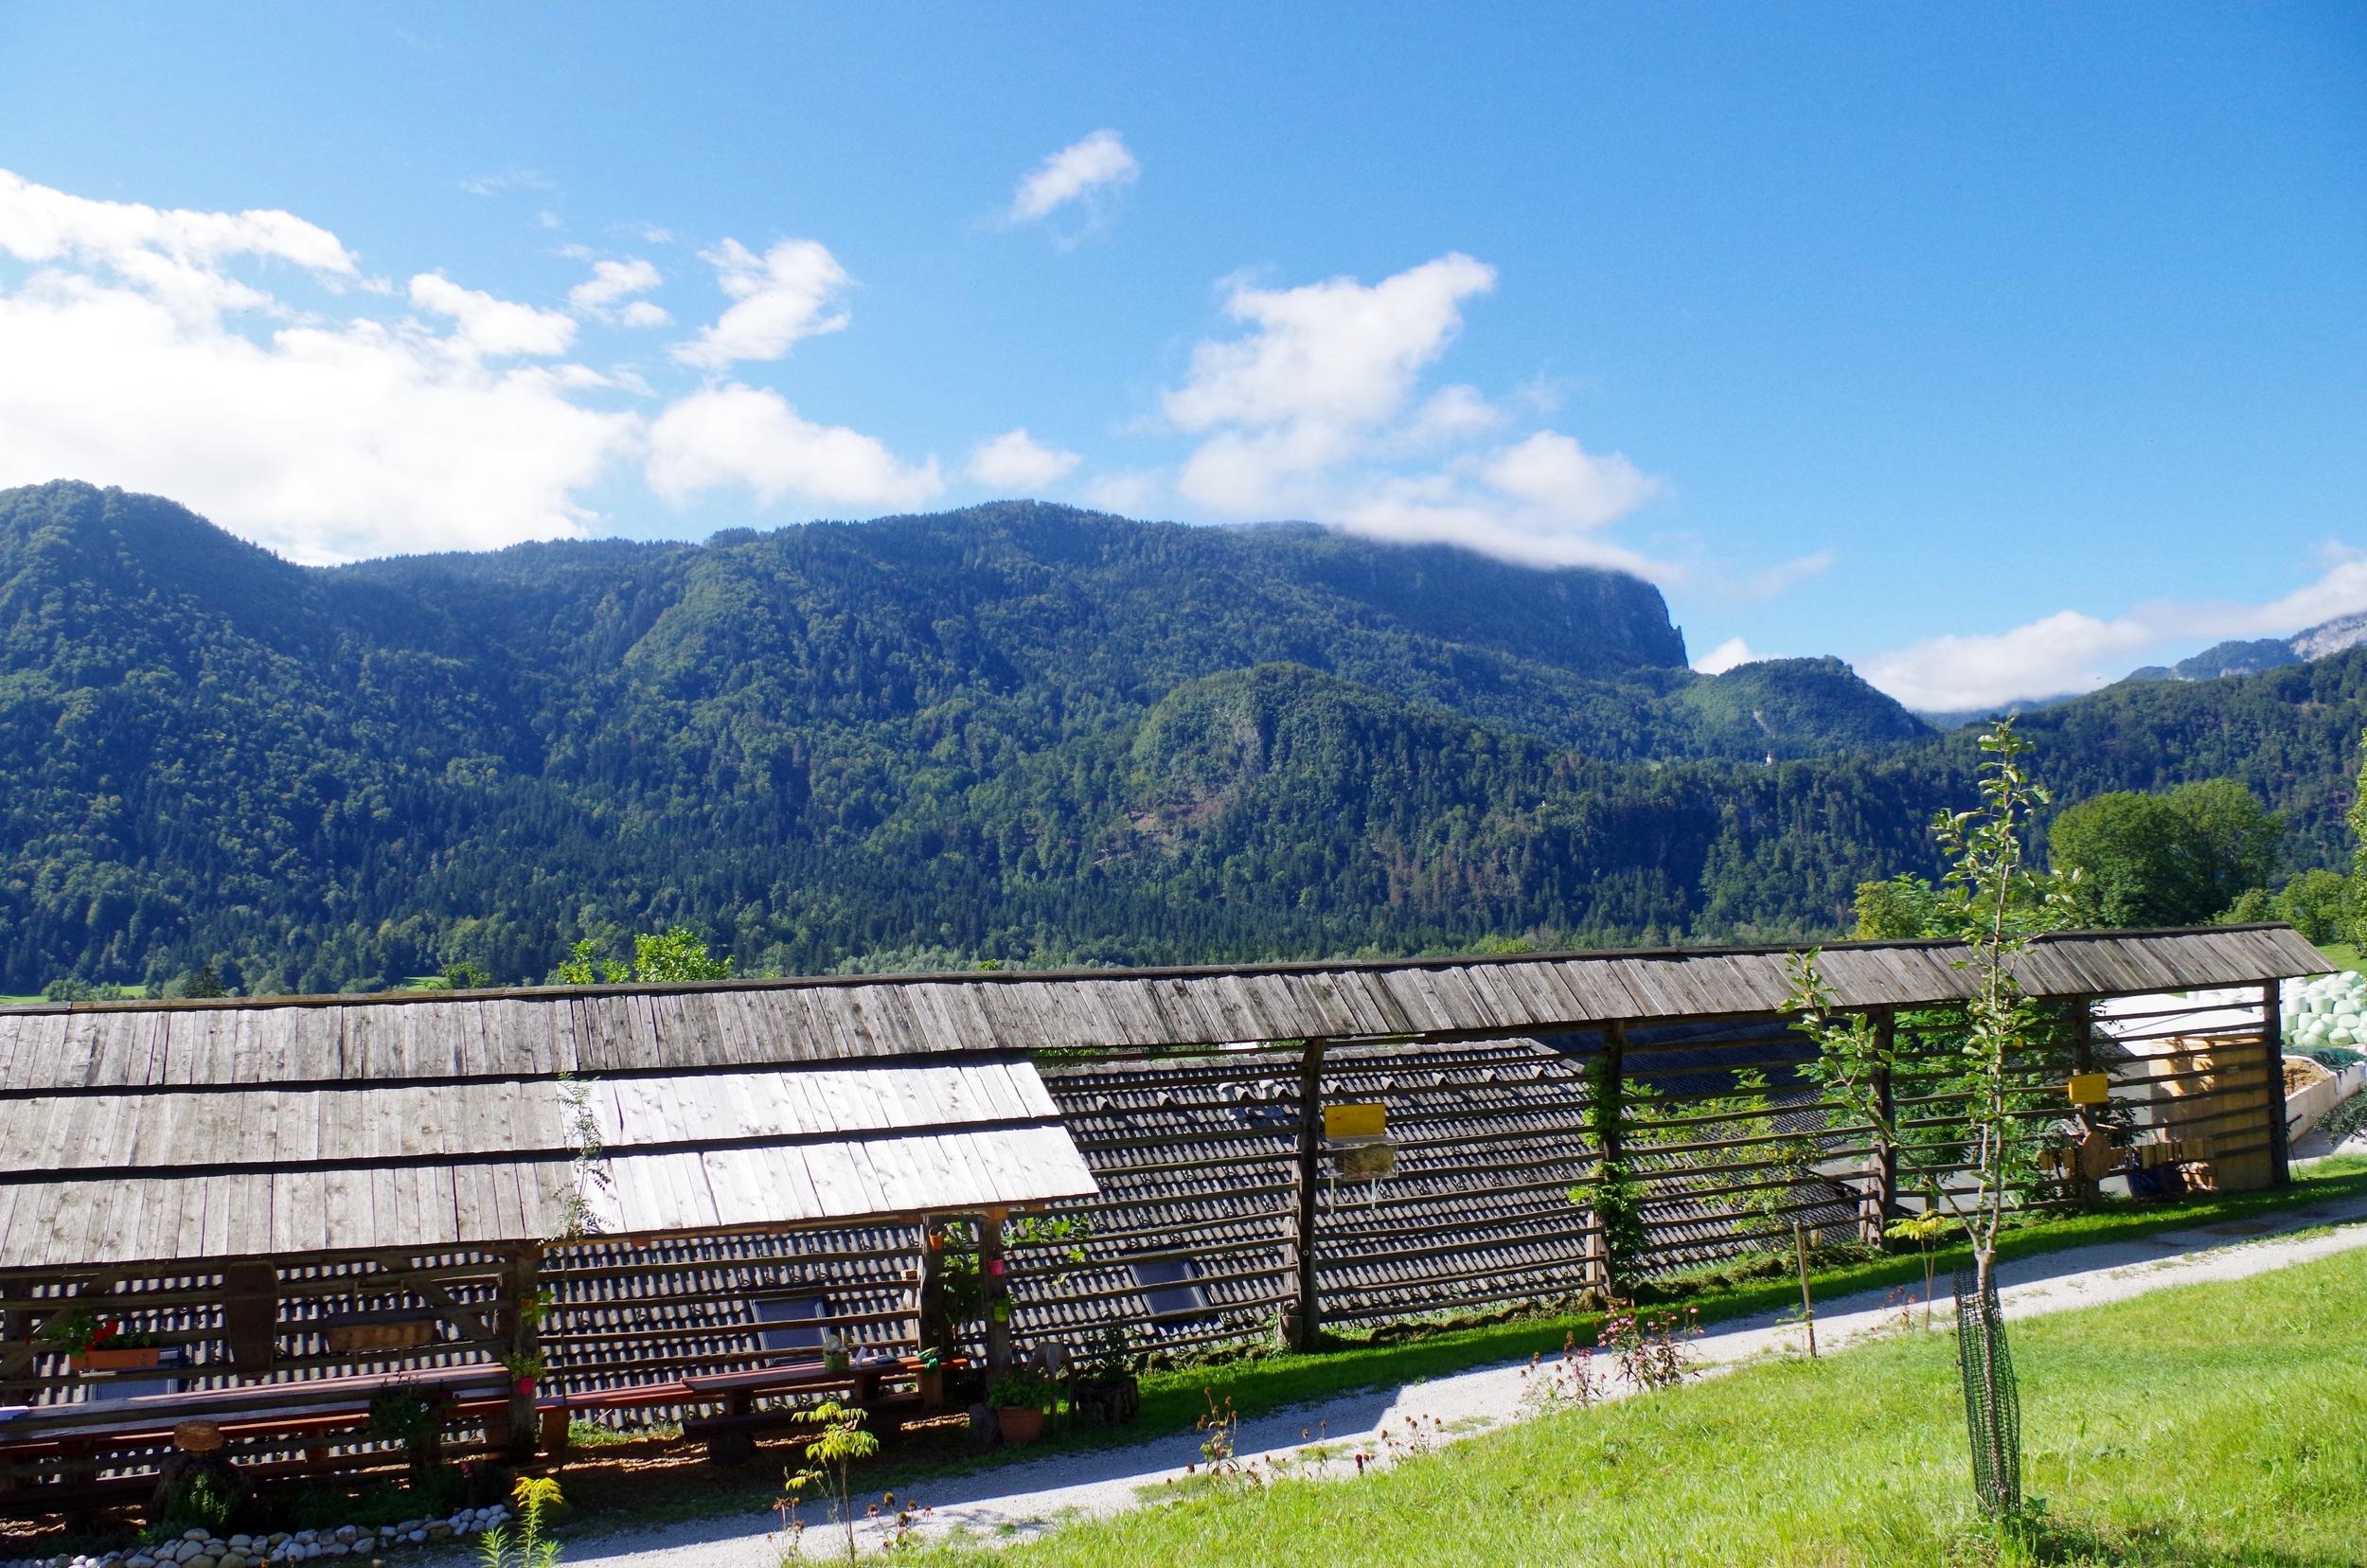 The view from Kralov Med